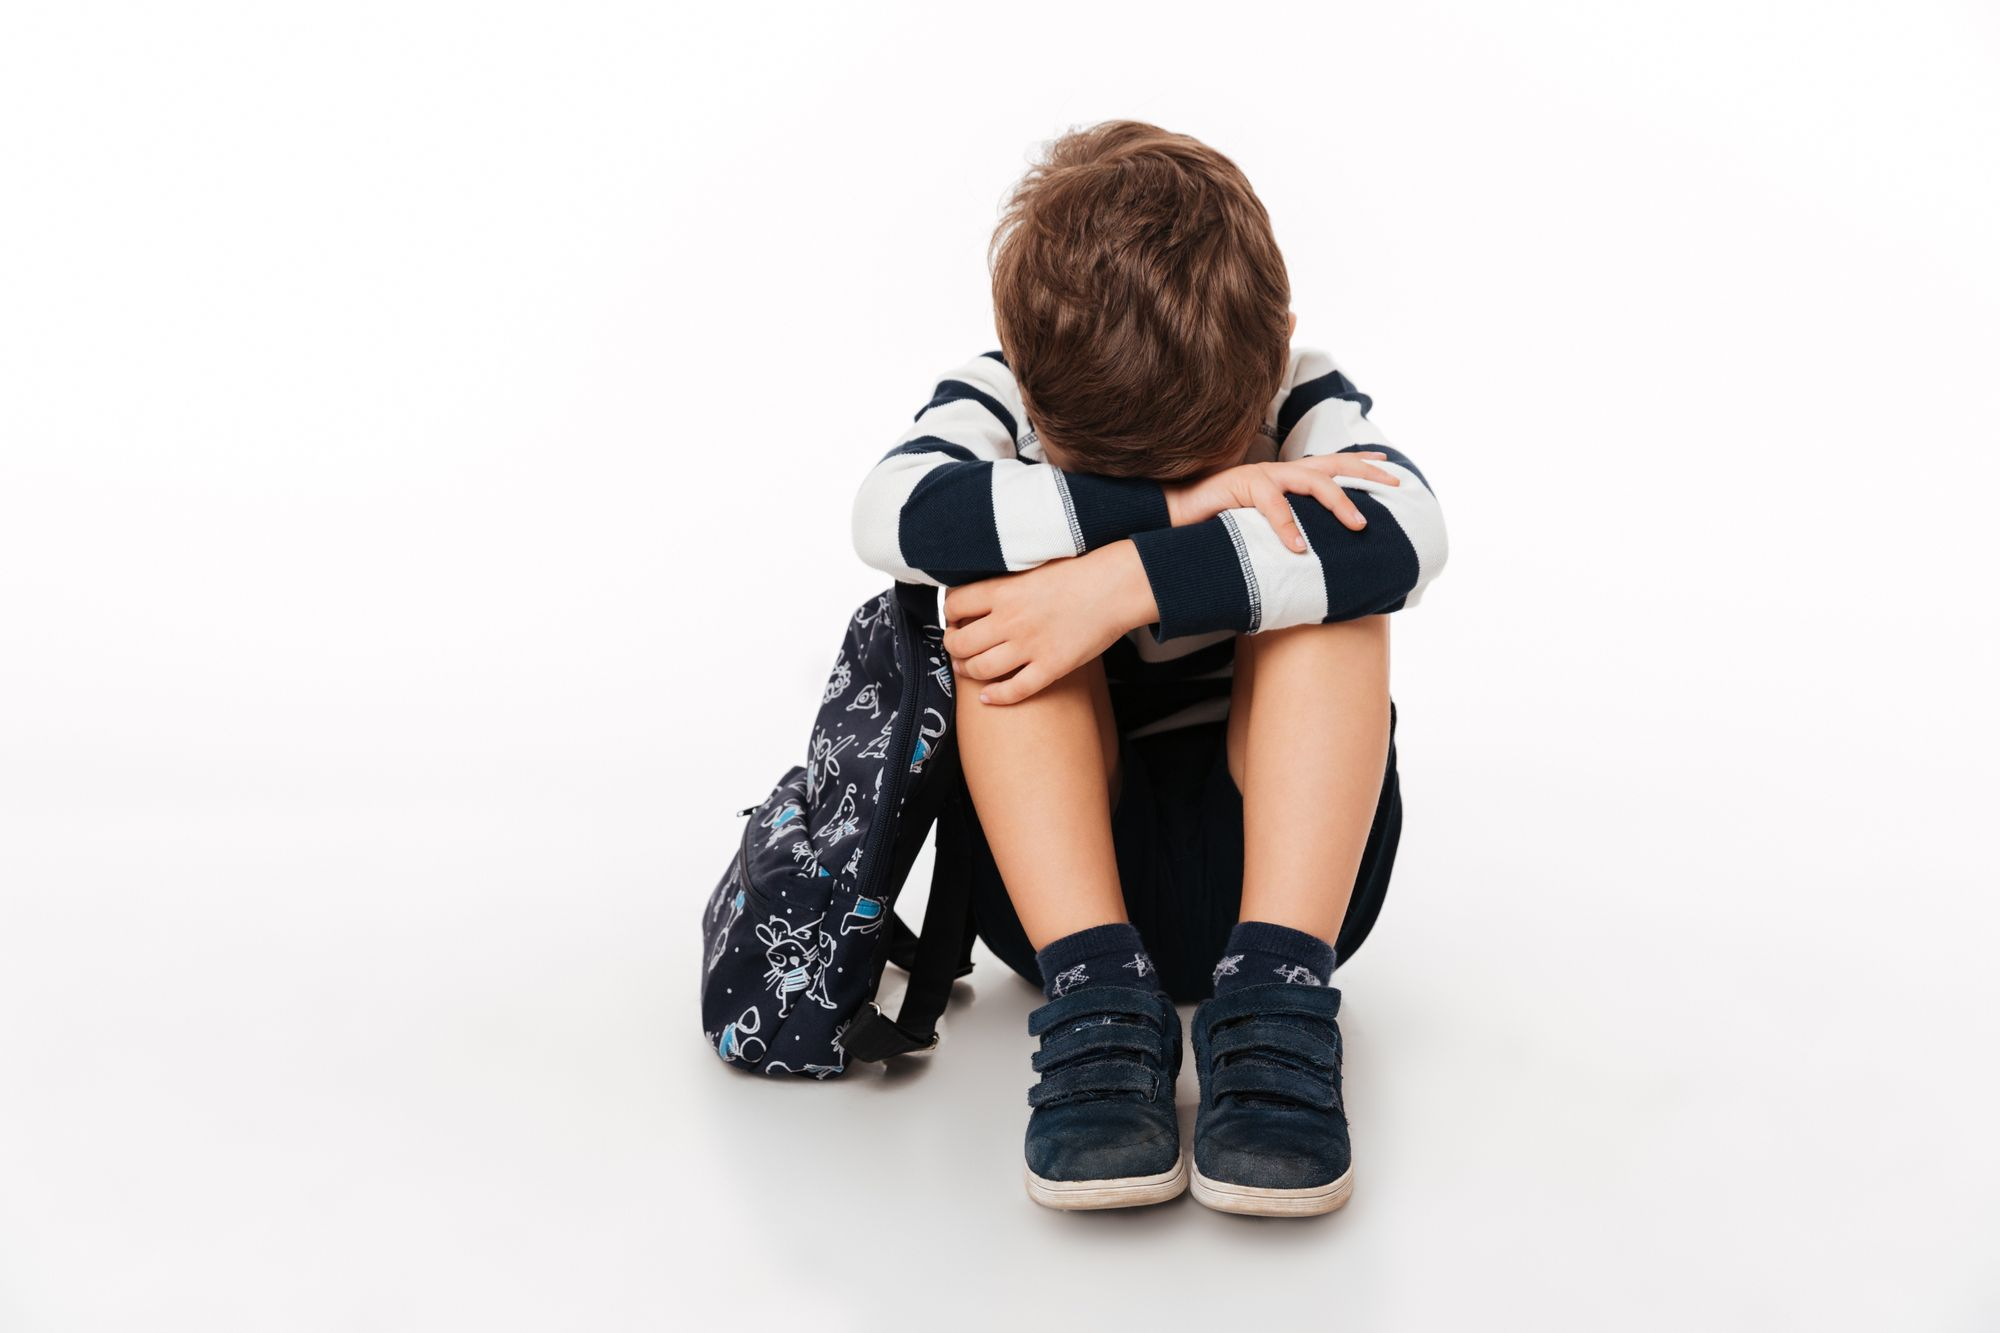 Bagaimana Saya Boleh Membantu Mempersiapkan Anak Saya Ke Prasekolah?